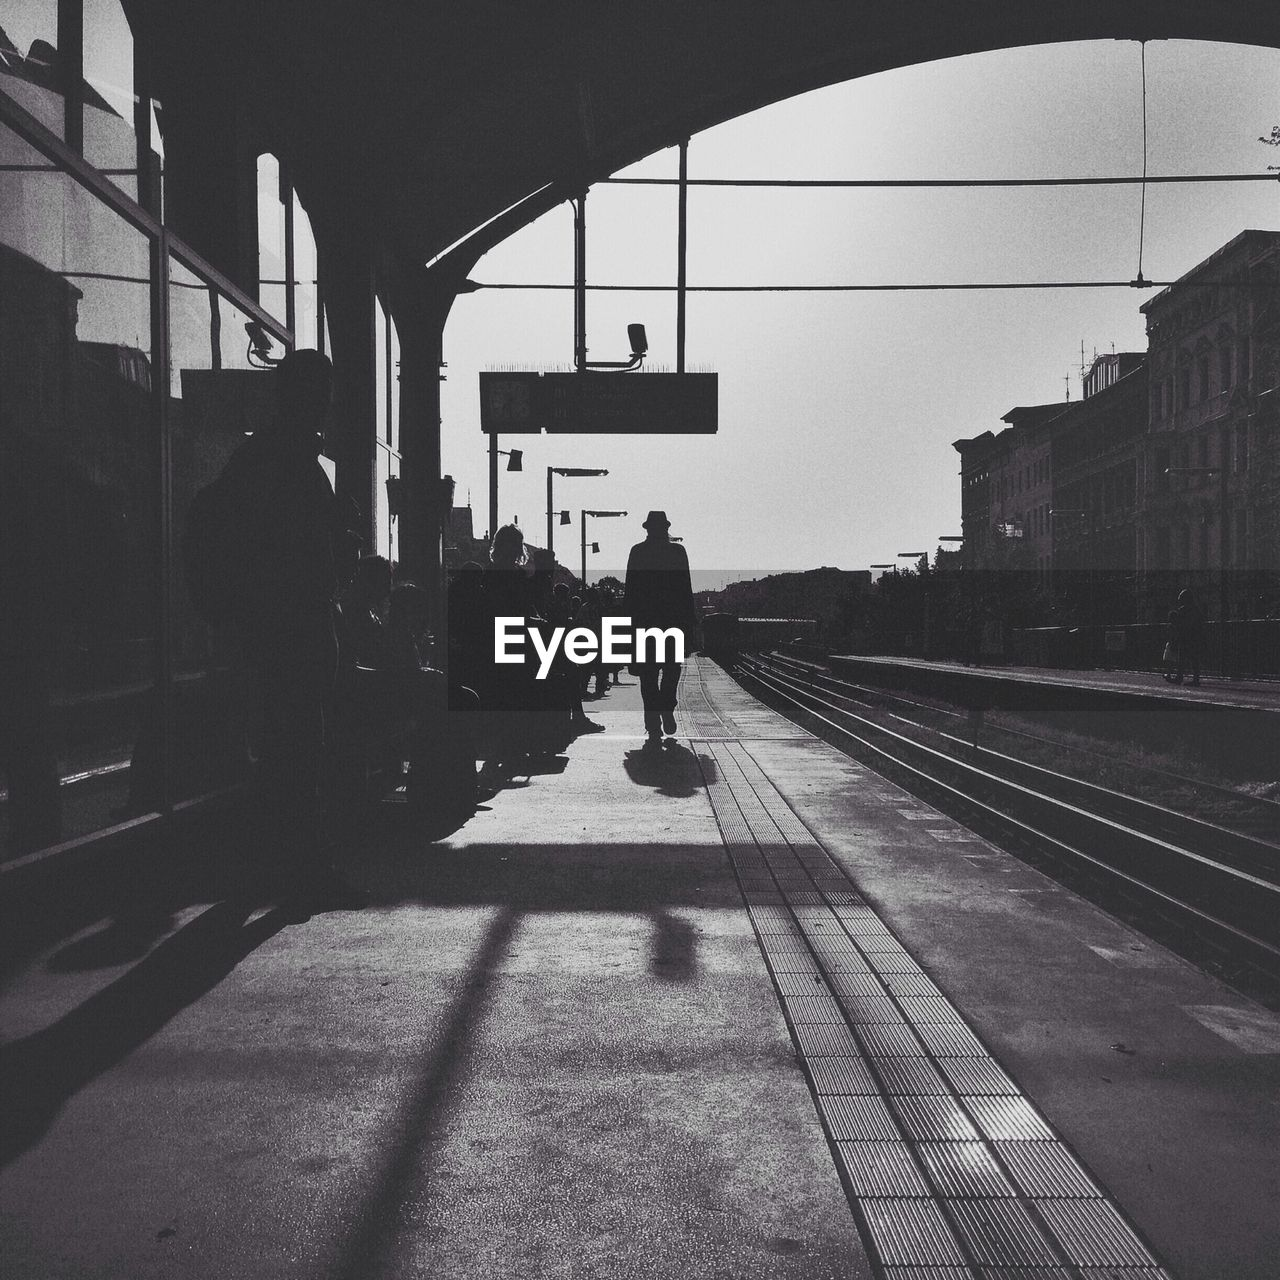 Silhouette people waiting on railroad station platform